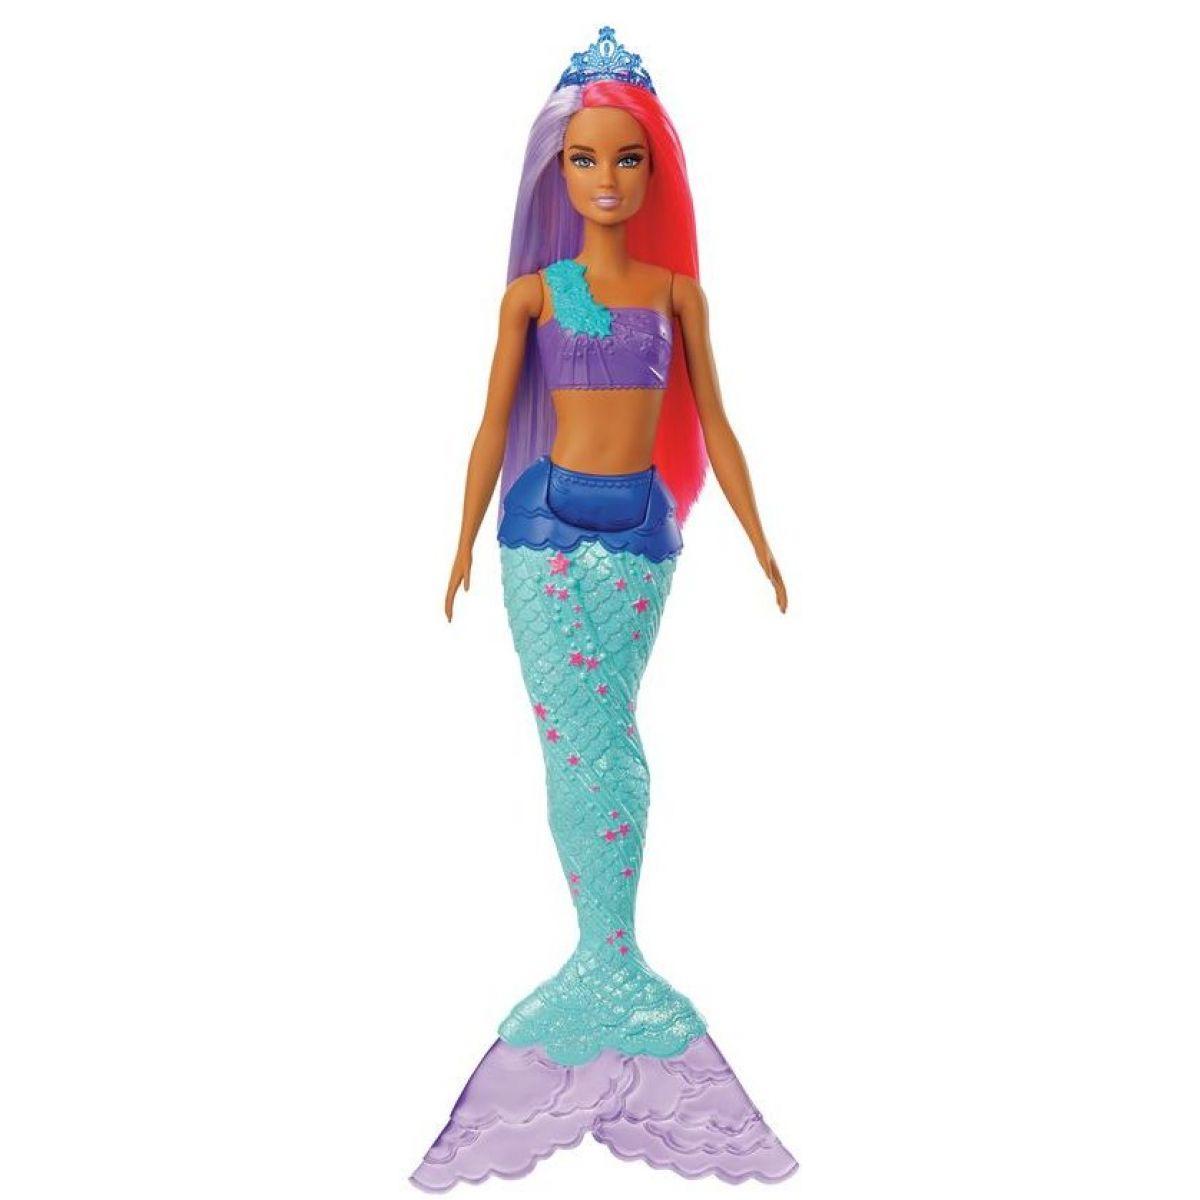 Mattel Barbie čarovná morská víla vlasy fialovo-červené